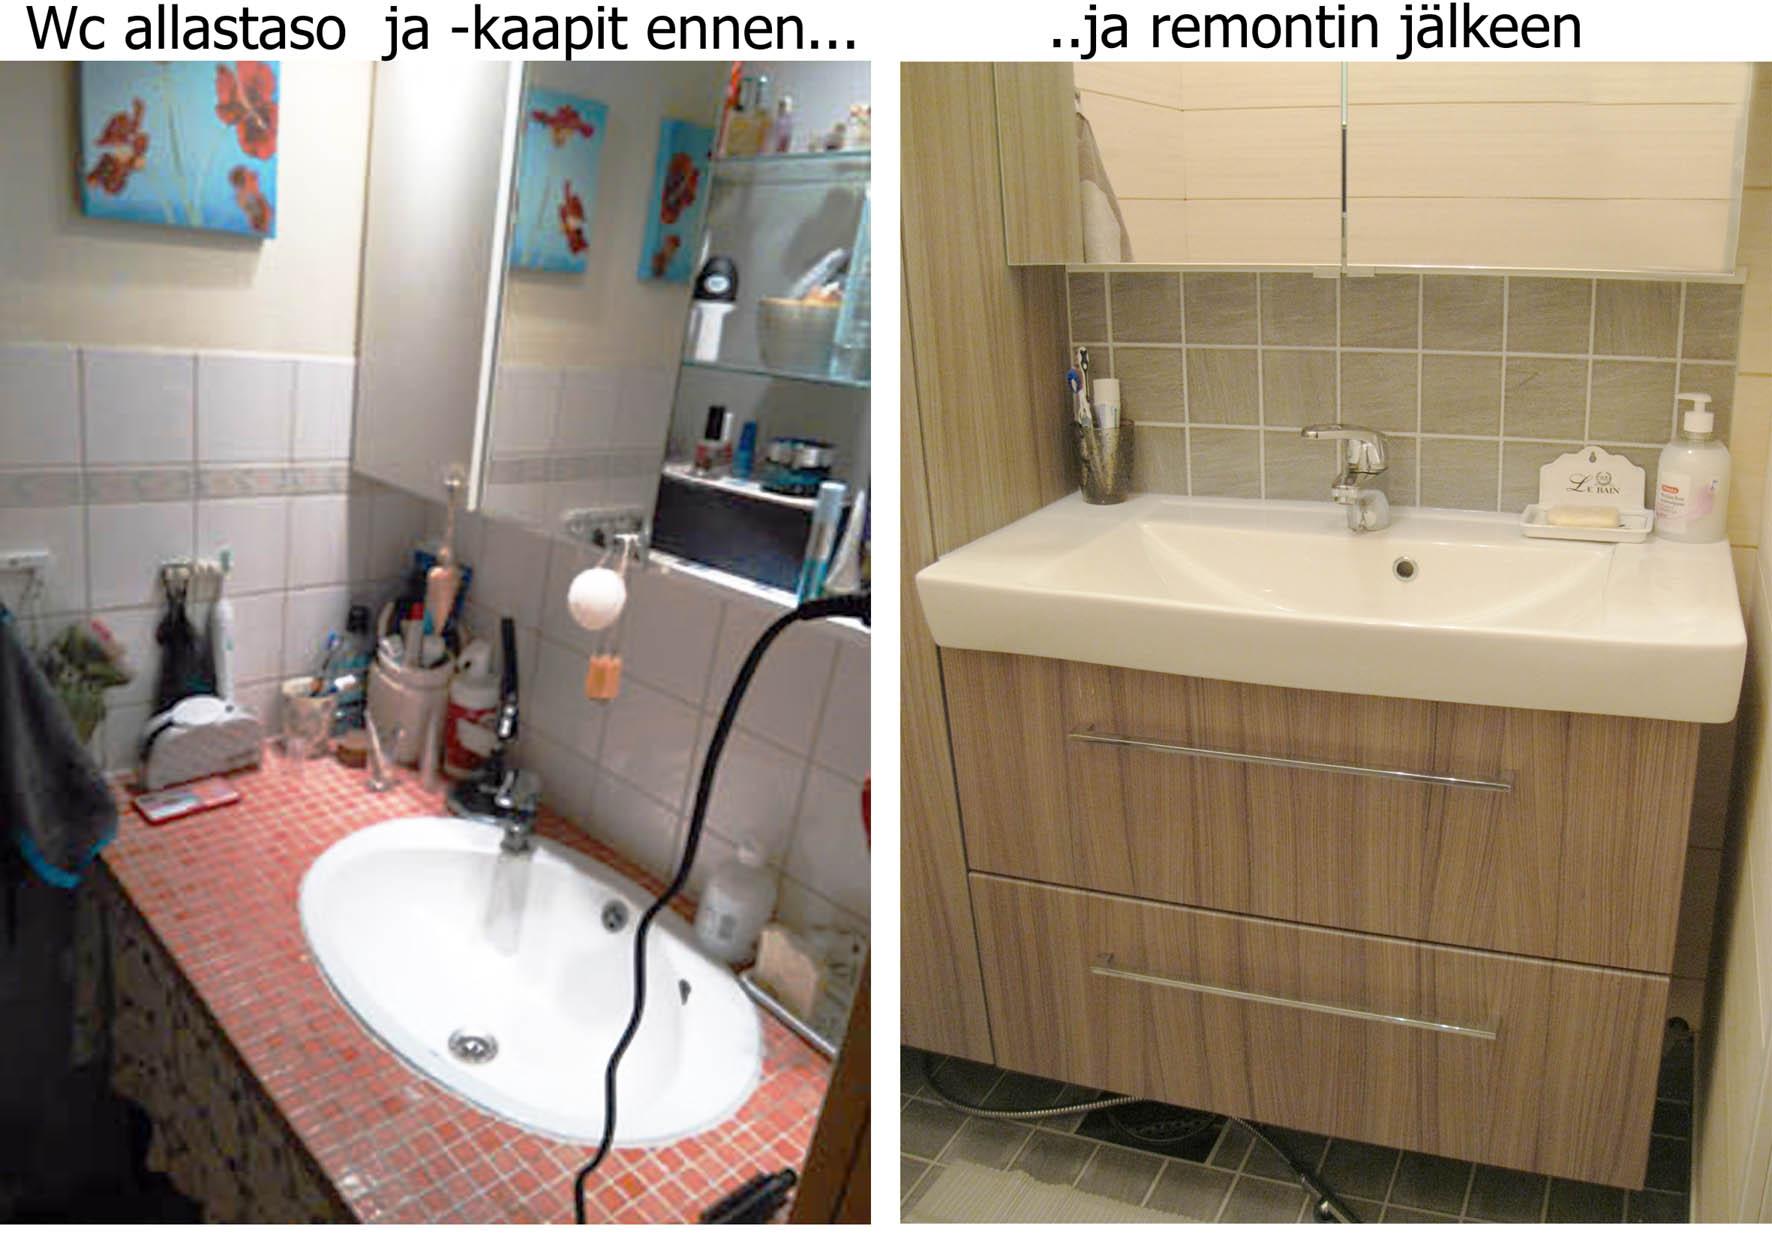 wc-allapuoli